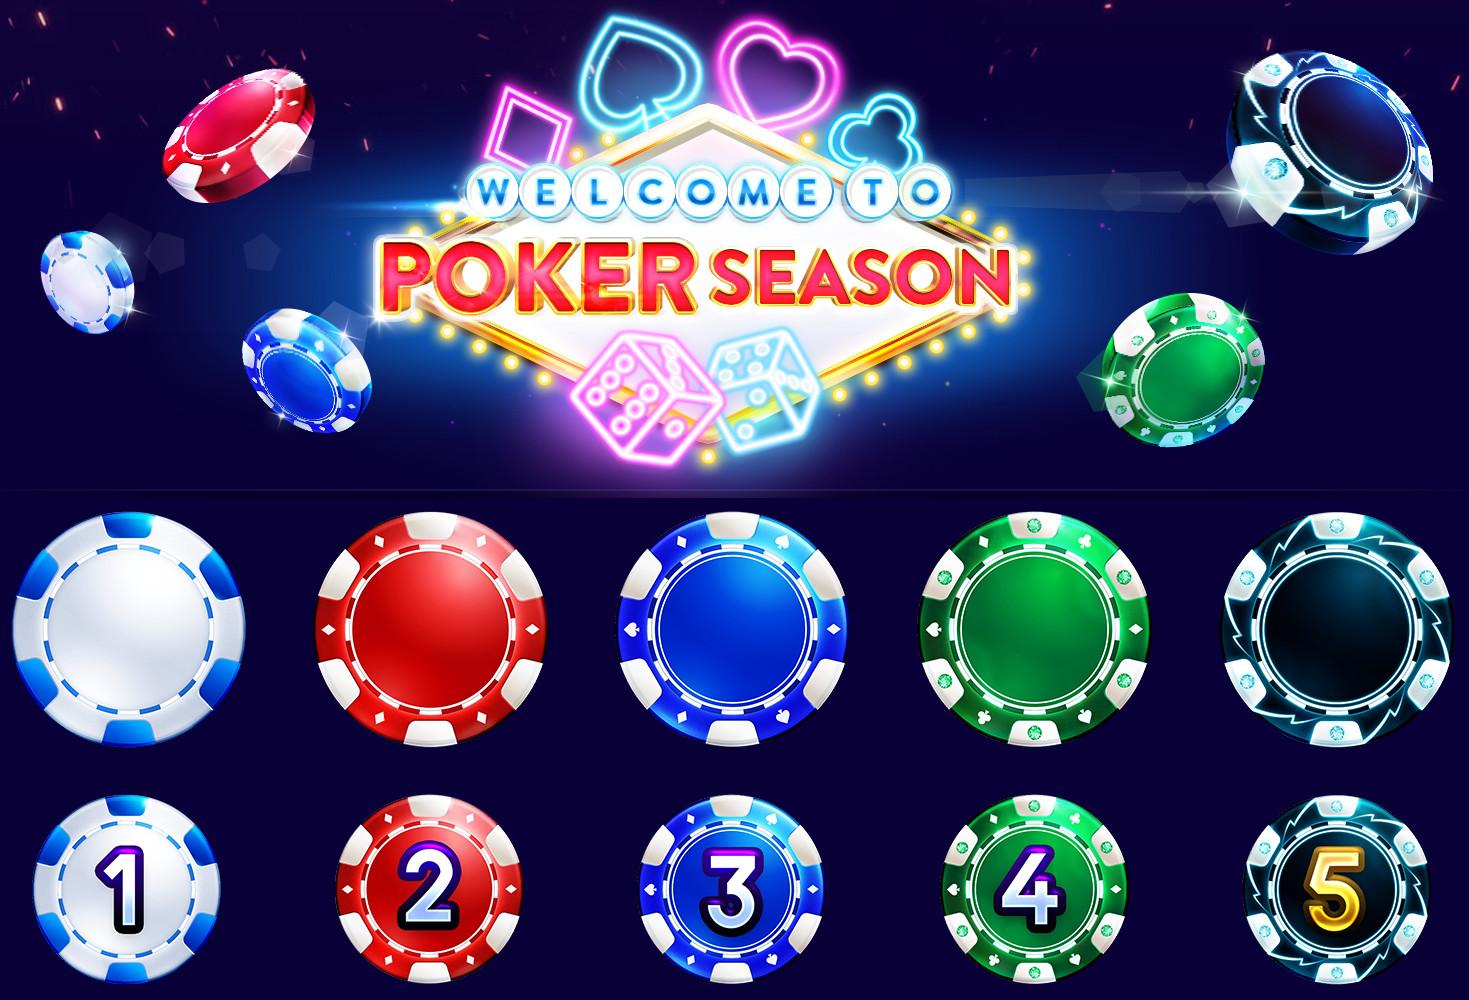 Ines robin 2 pokerseason